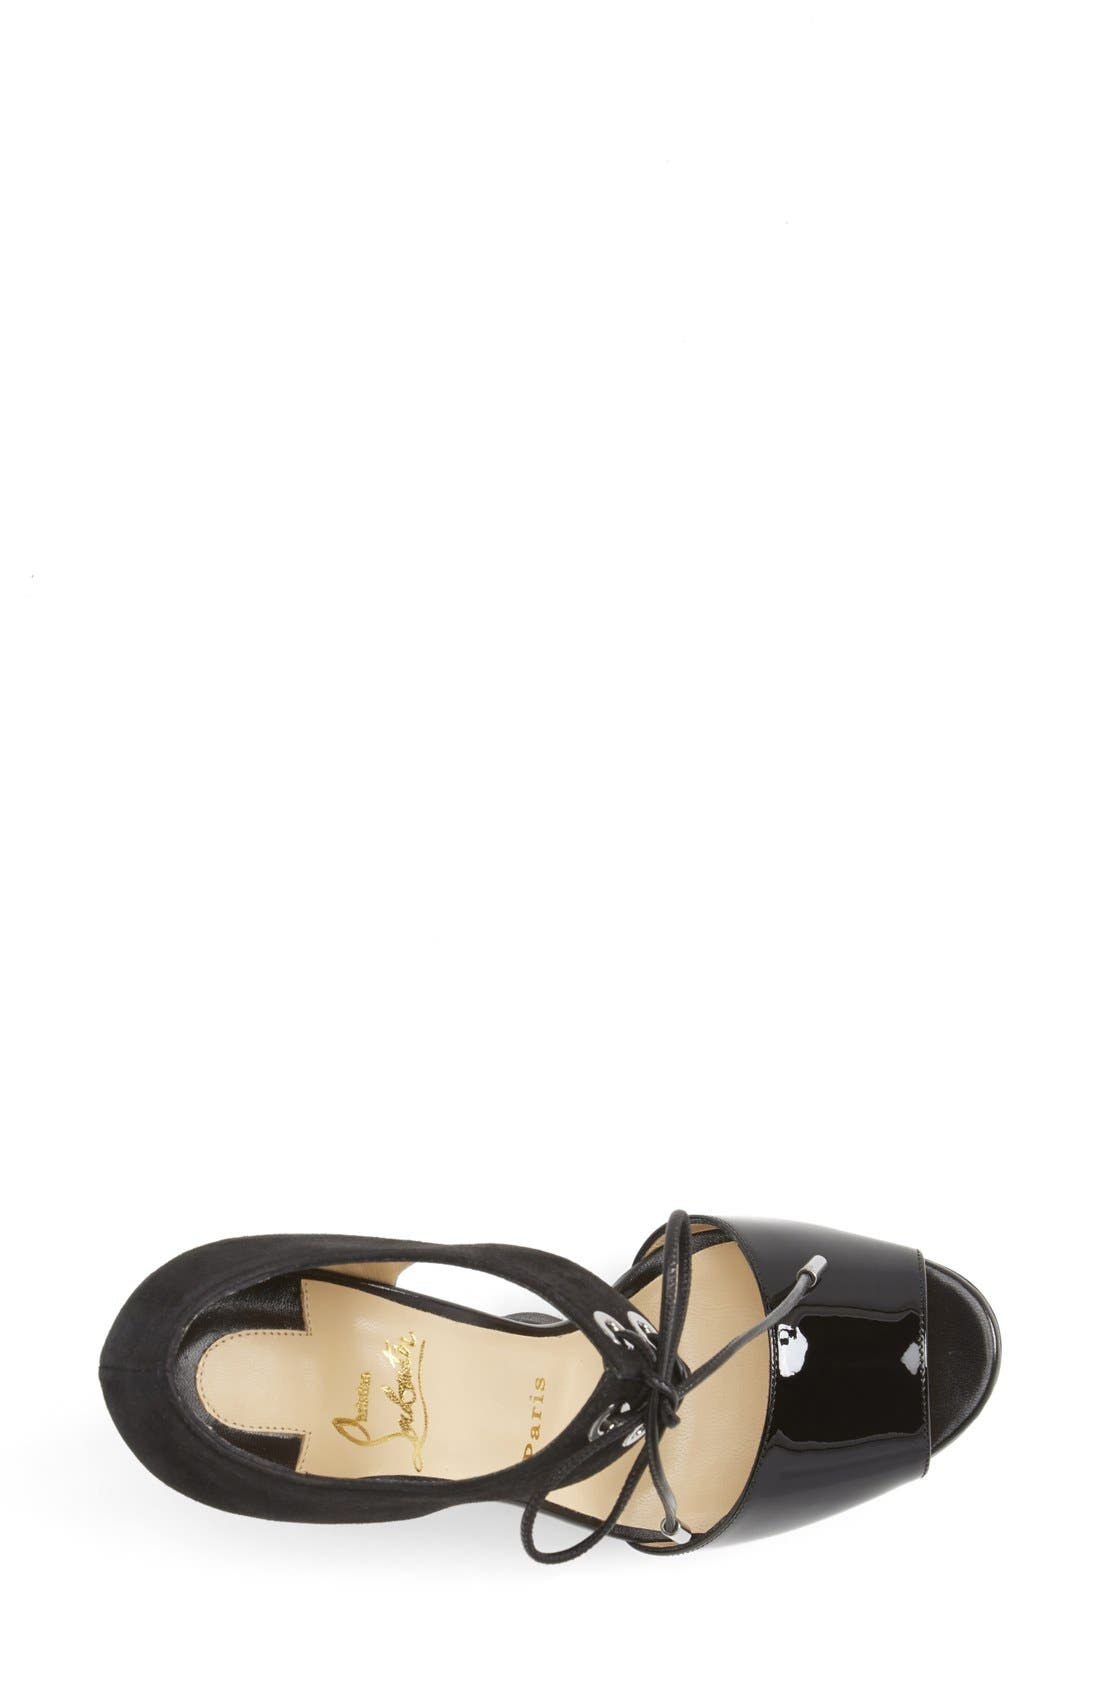 Alternate Image 3  - Christian Louboutin Tie-Up Leather Sandal